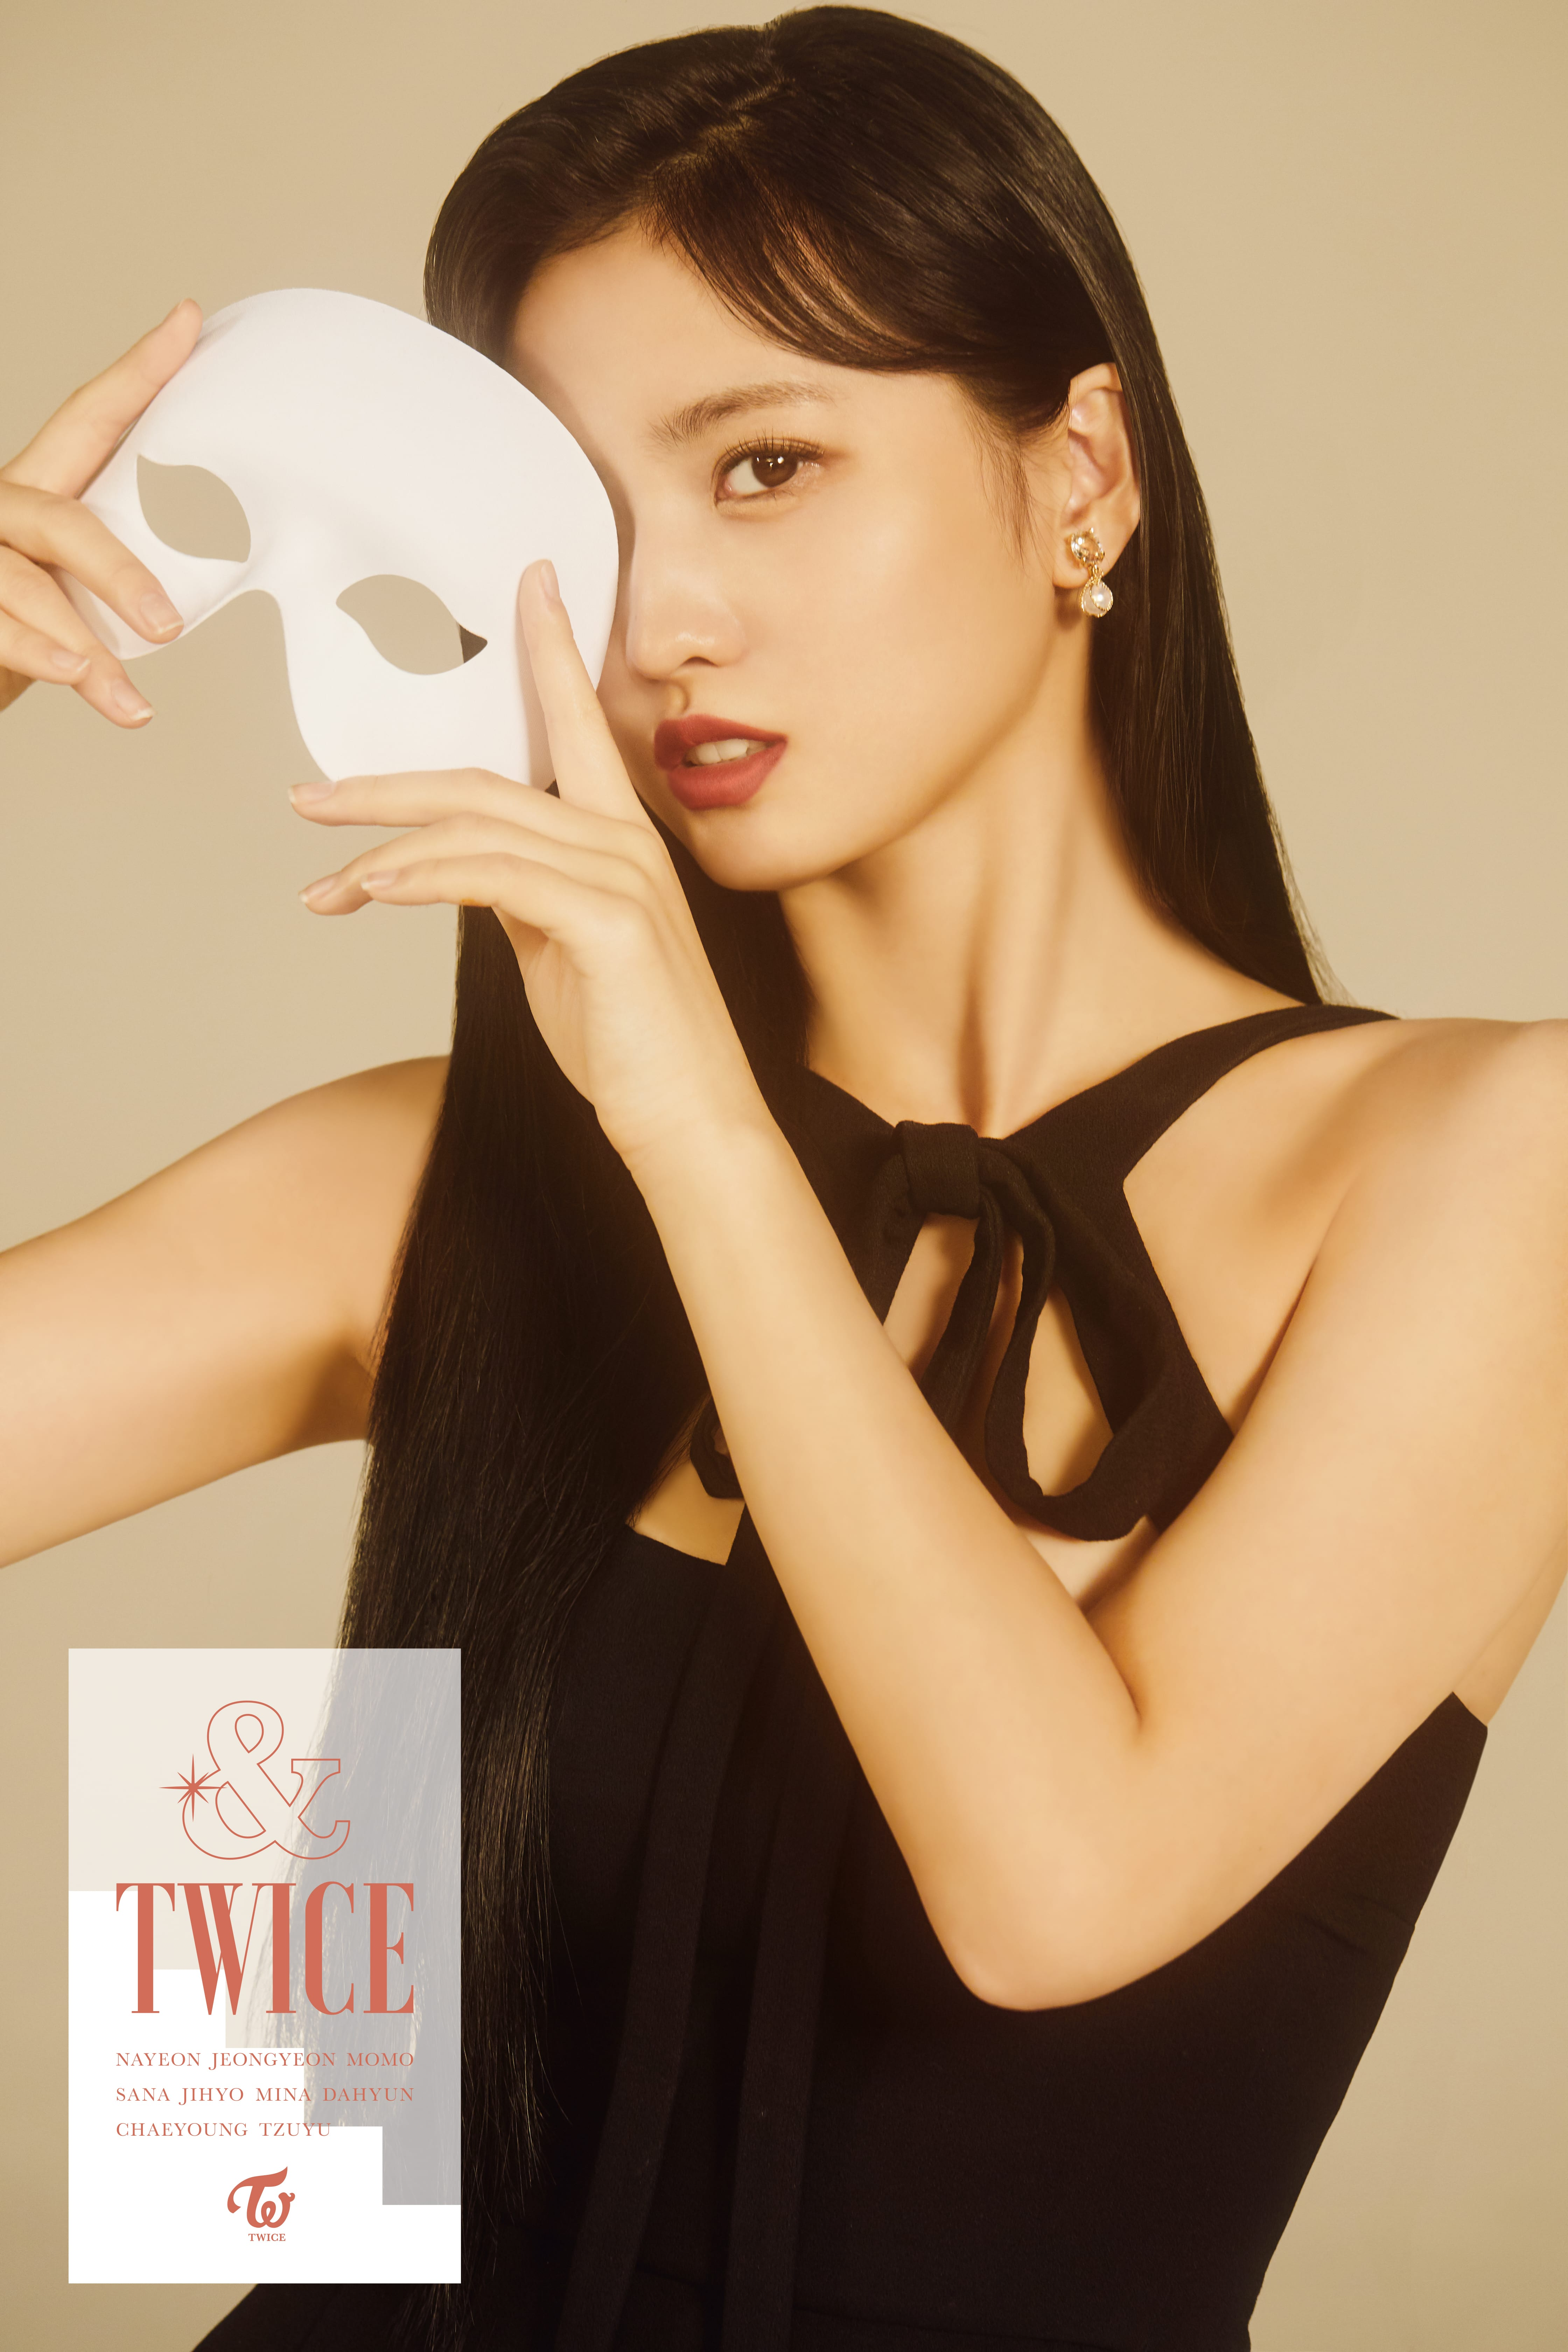 Twice Twice Concept Photos Nayeon Jeongyeon Momo Sana Jihyo